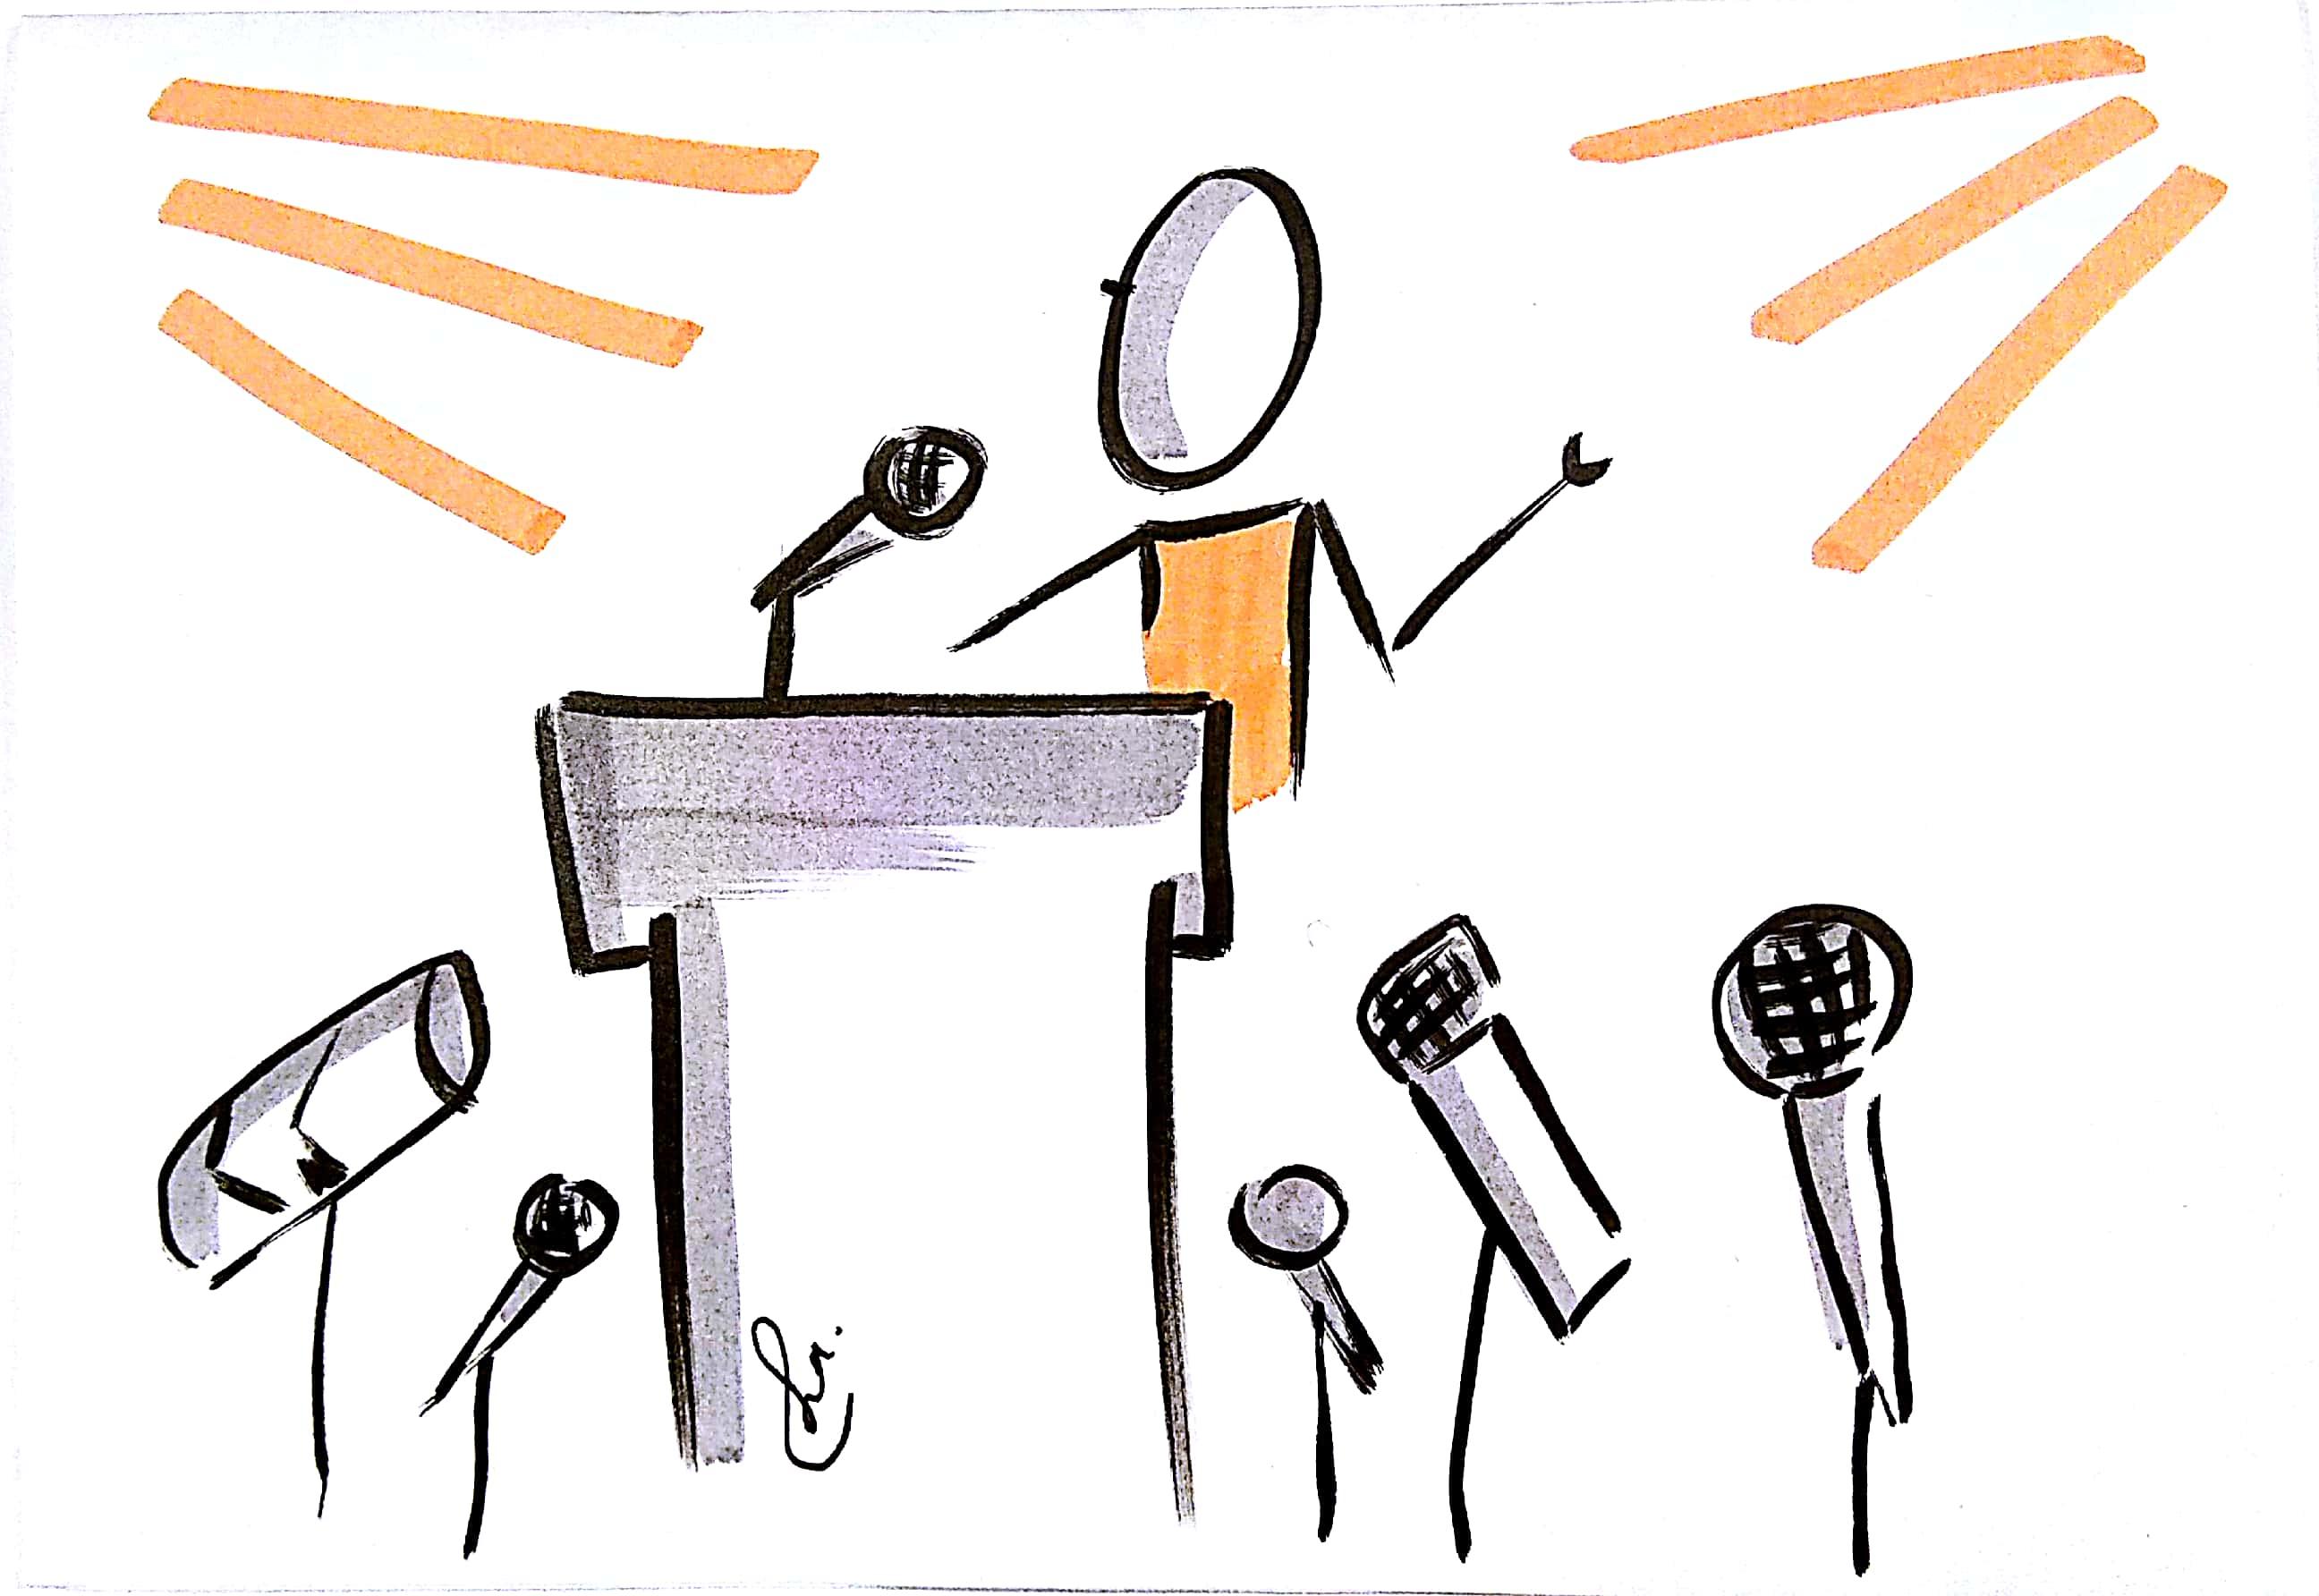 Public Speaking, Presentation Skills